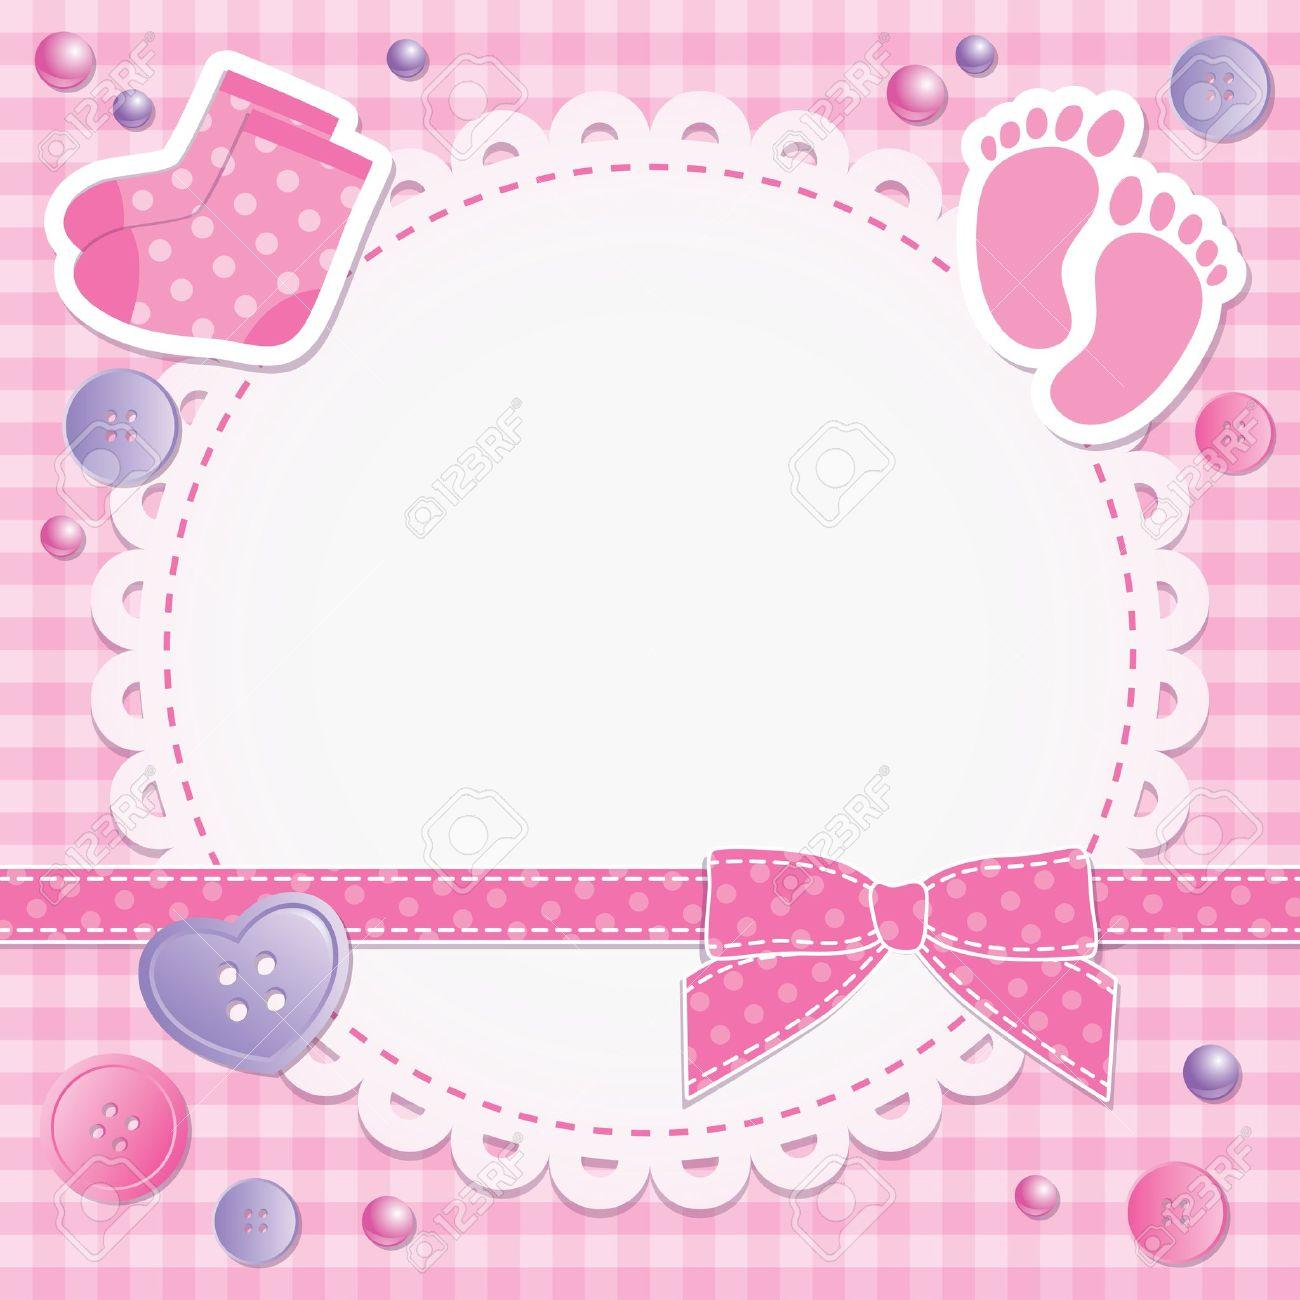 Baby Girl Wallpaper: Baby Girl Wallpaper Borders